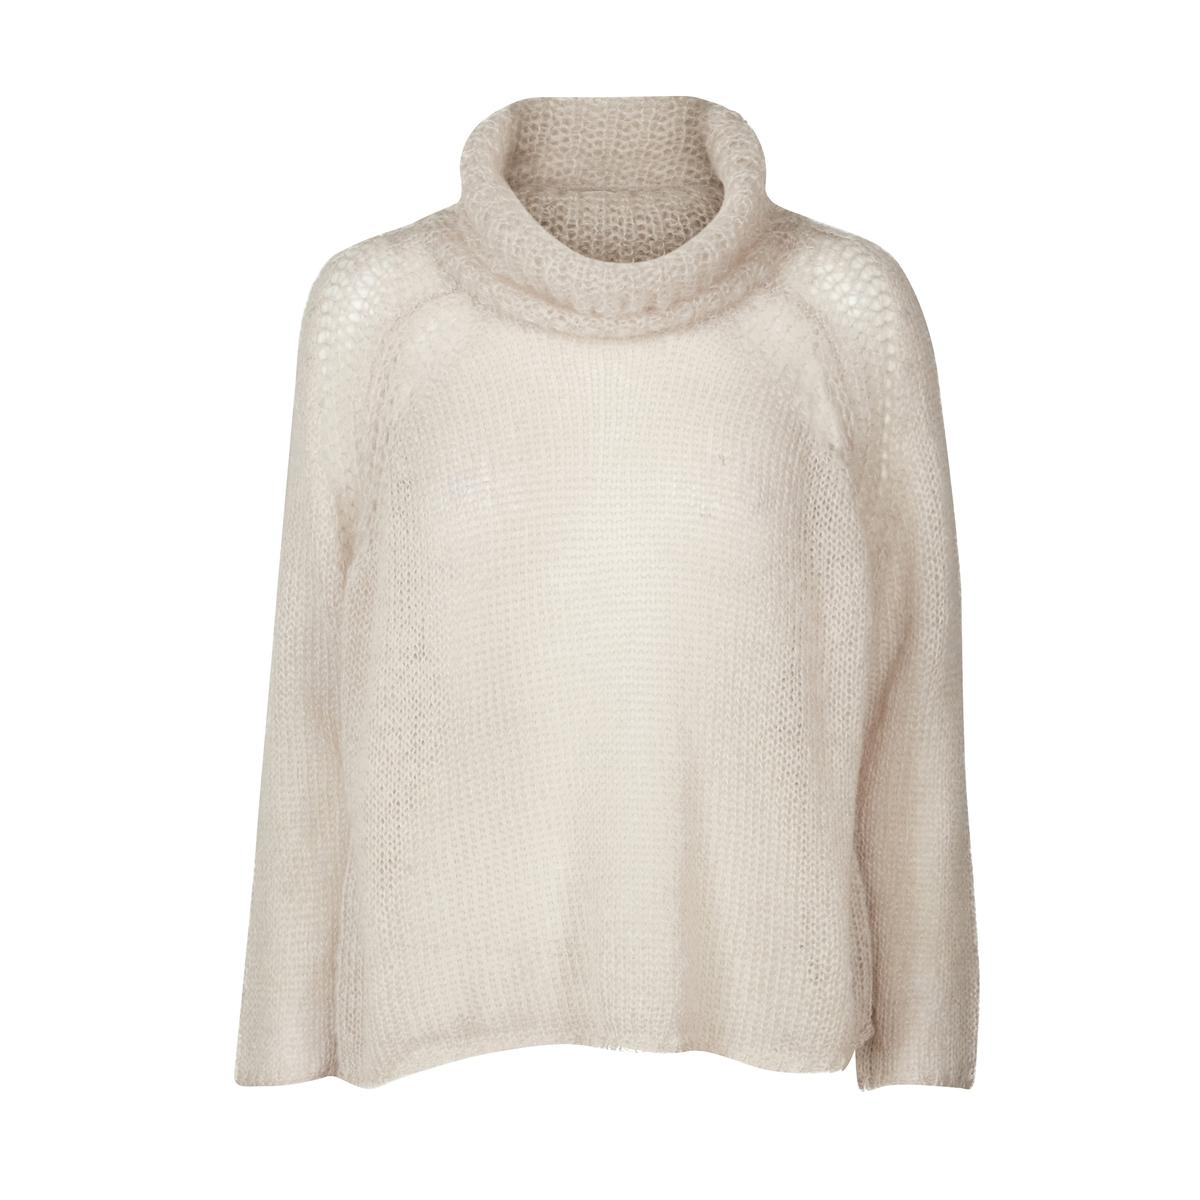 Пуловер-водолазка из тонкого трикотажа от AND LESS